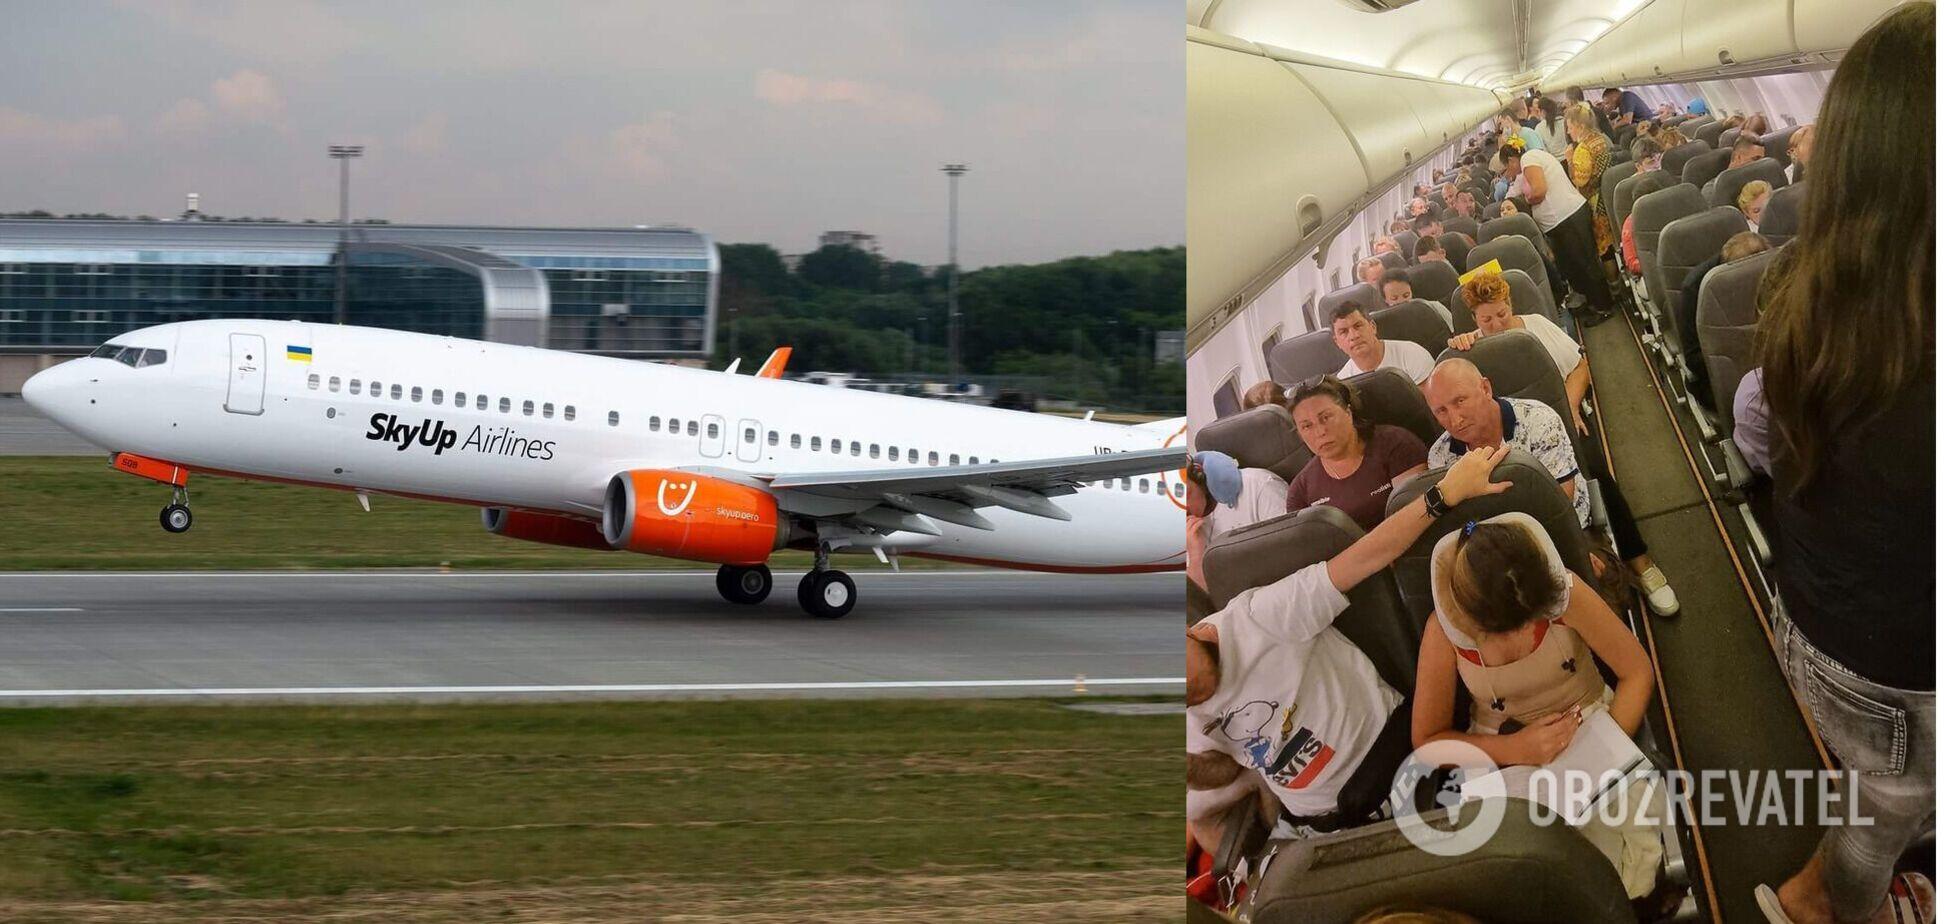 Літак з українцями, які летіли із Занзібару, застряг в Африці